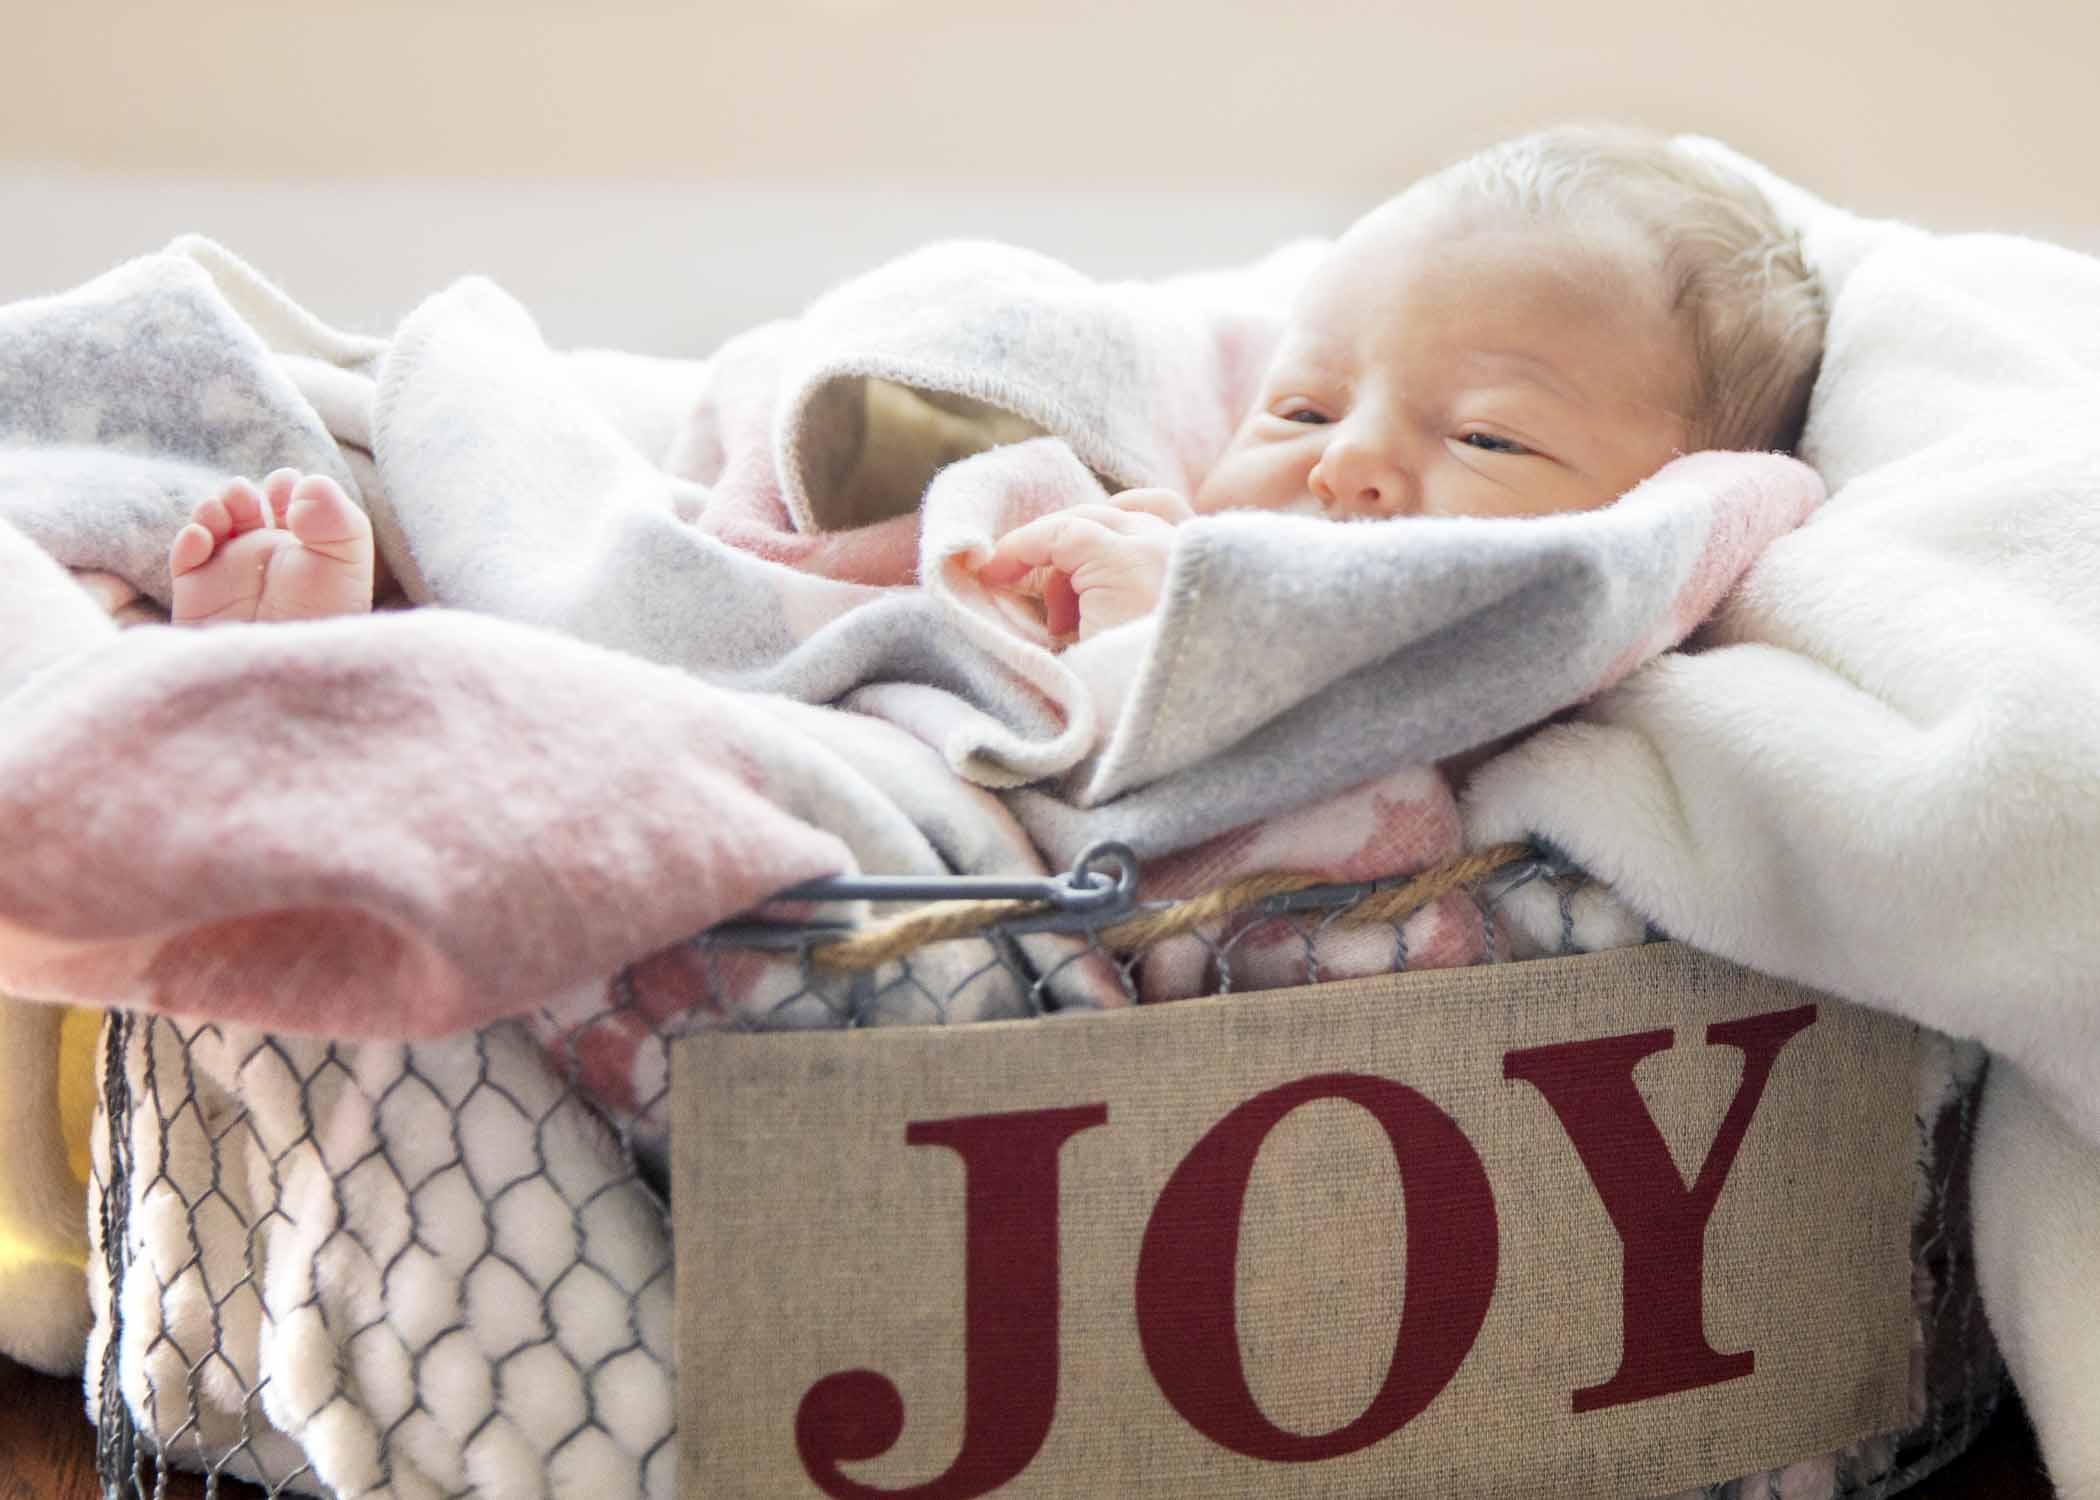 Mr. DJV Covey Family-Newborn-JJI2018 -19.jpg